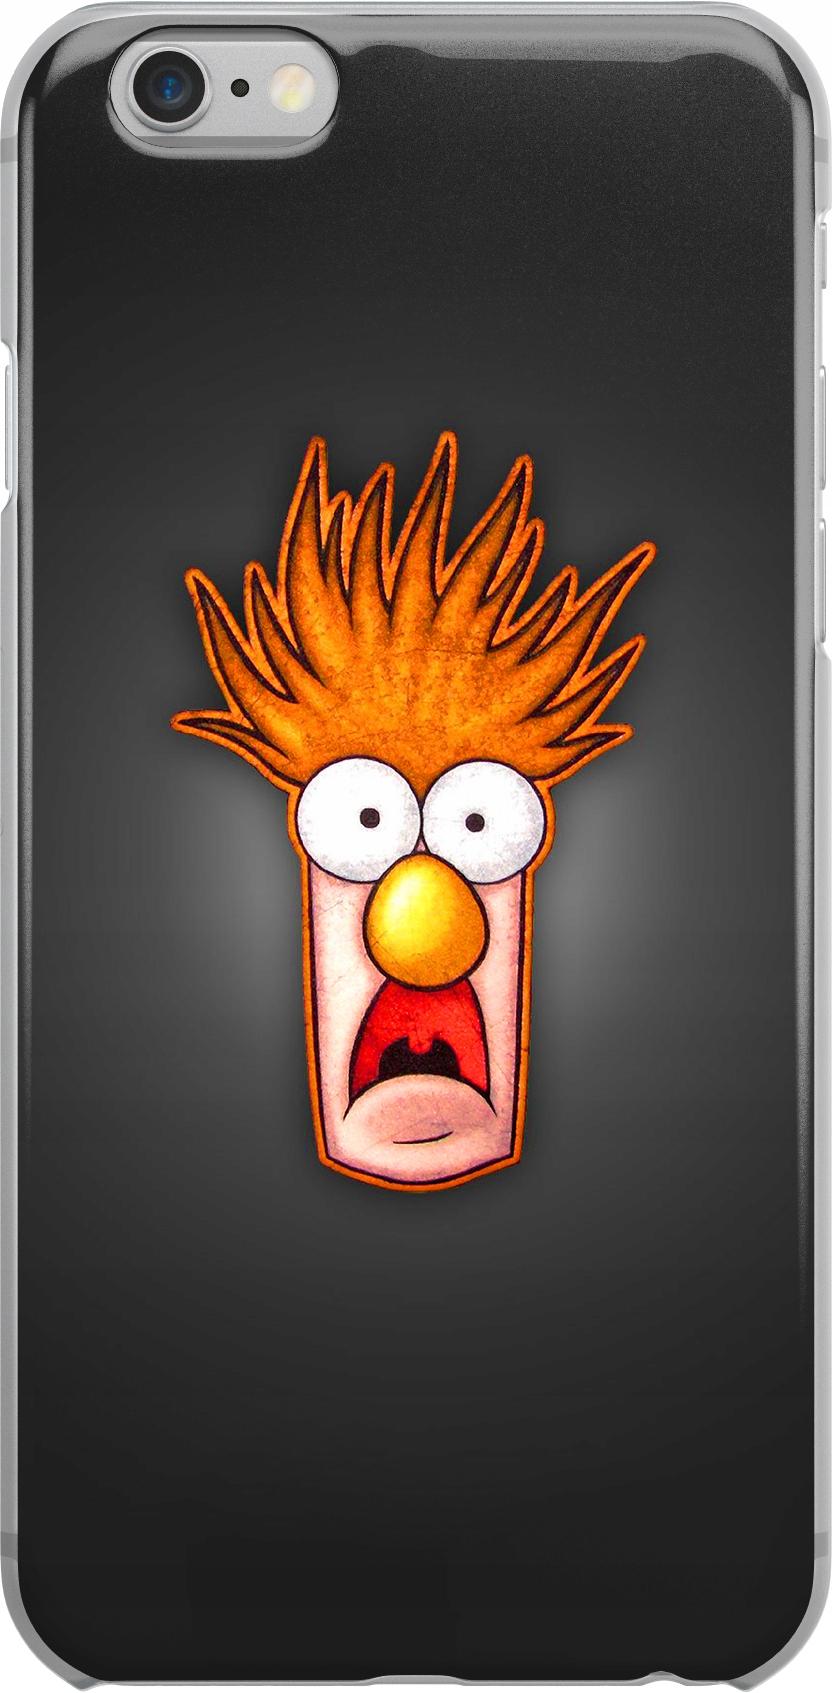 Etui Wzory Muppety Huawei Y8P